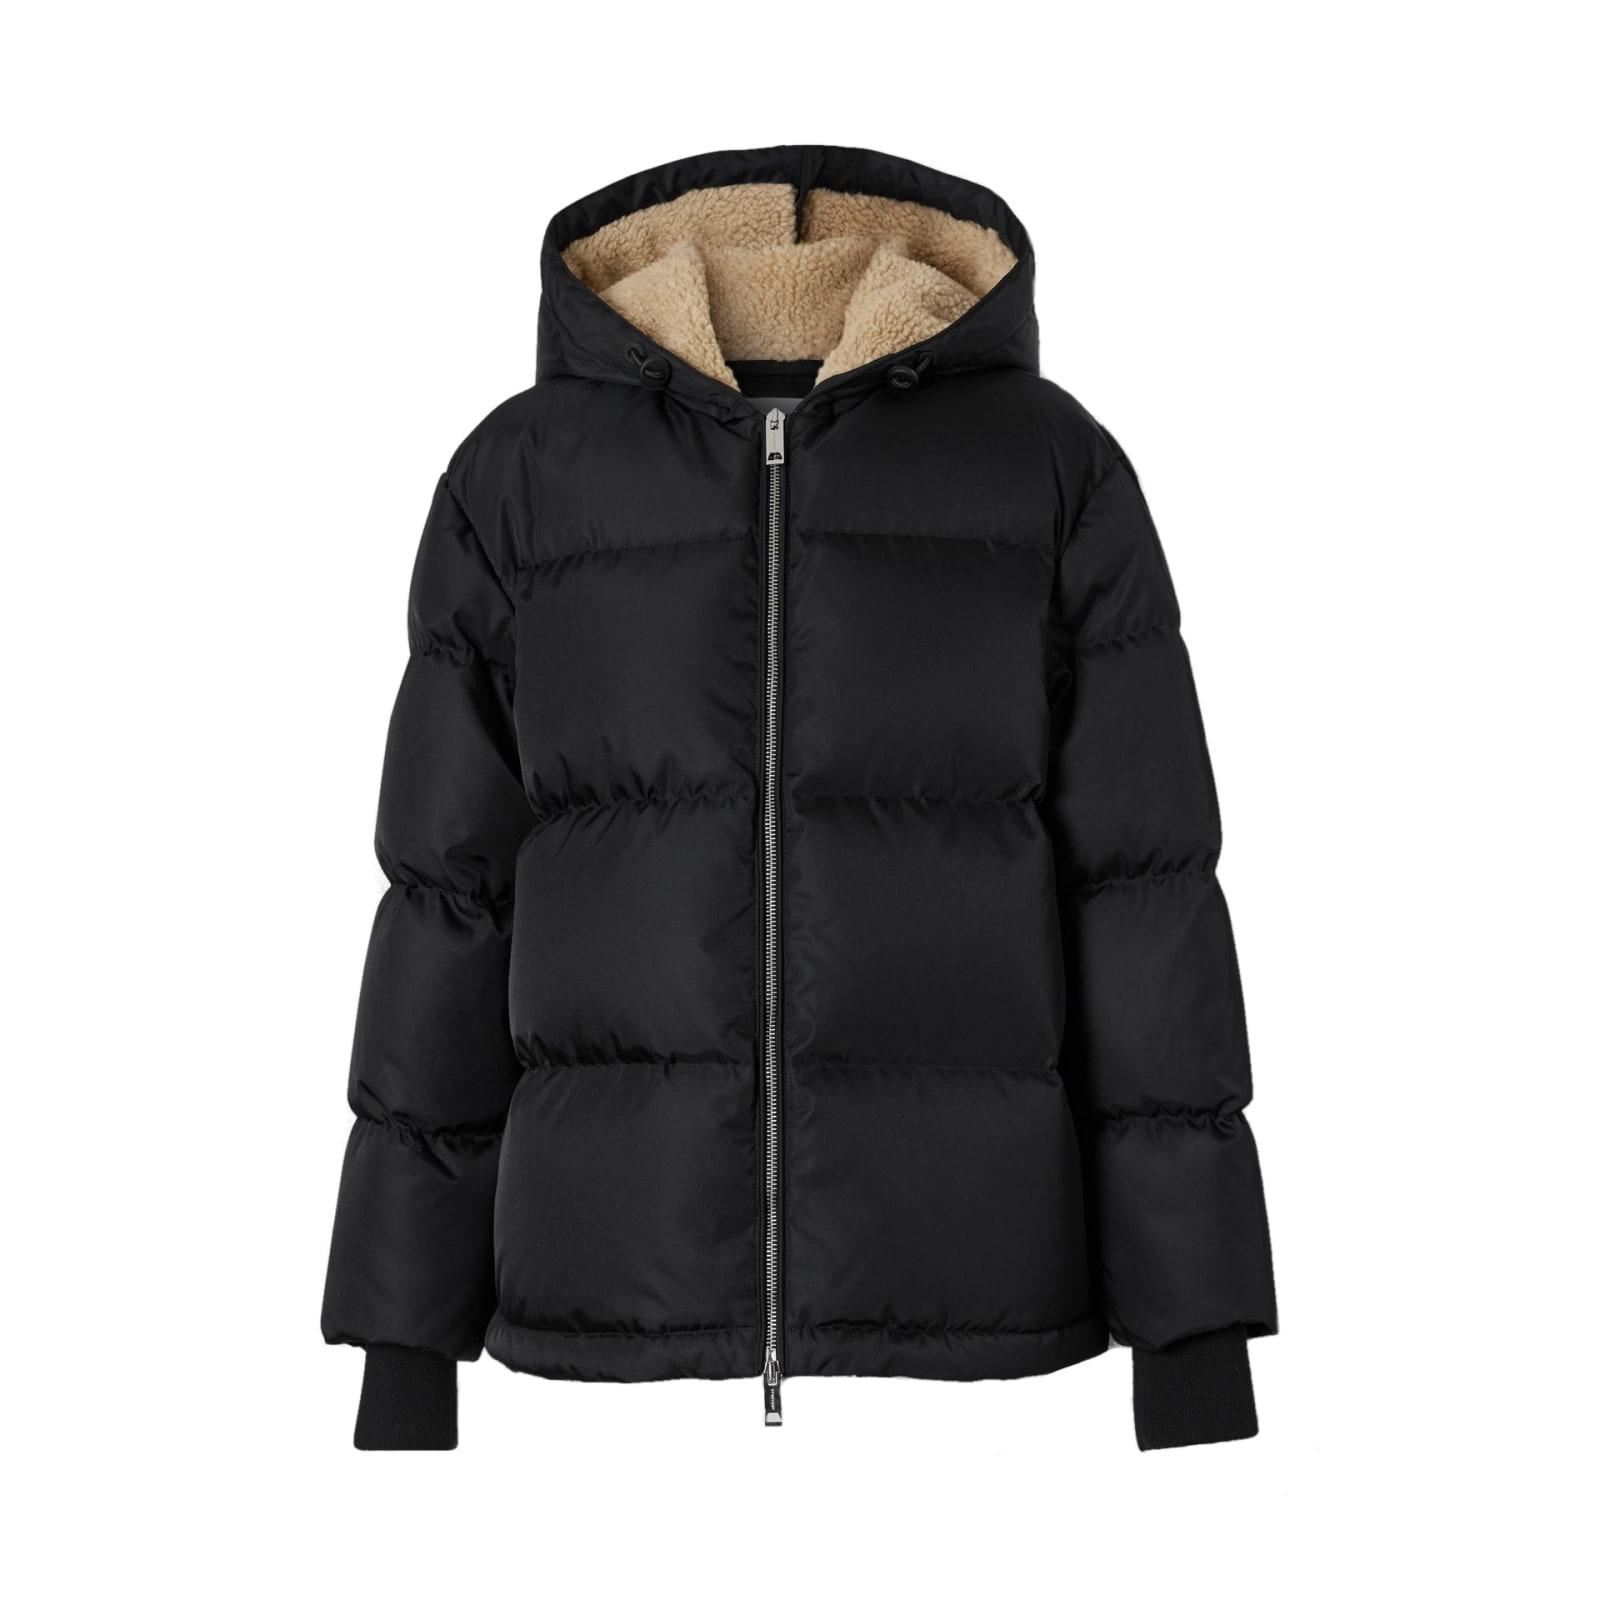 Burberry Seafield Hood Zip Jacket